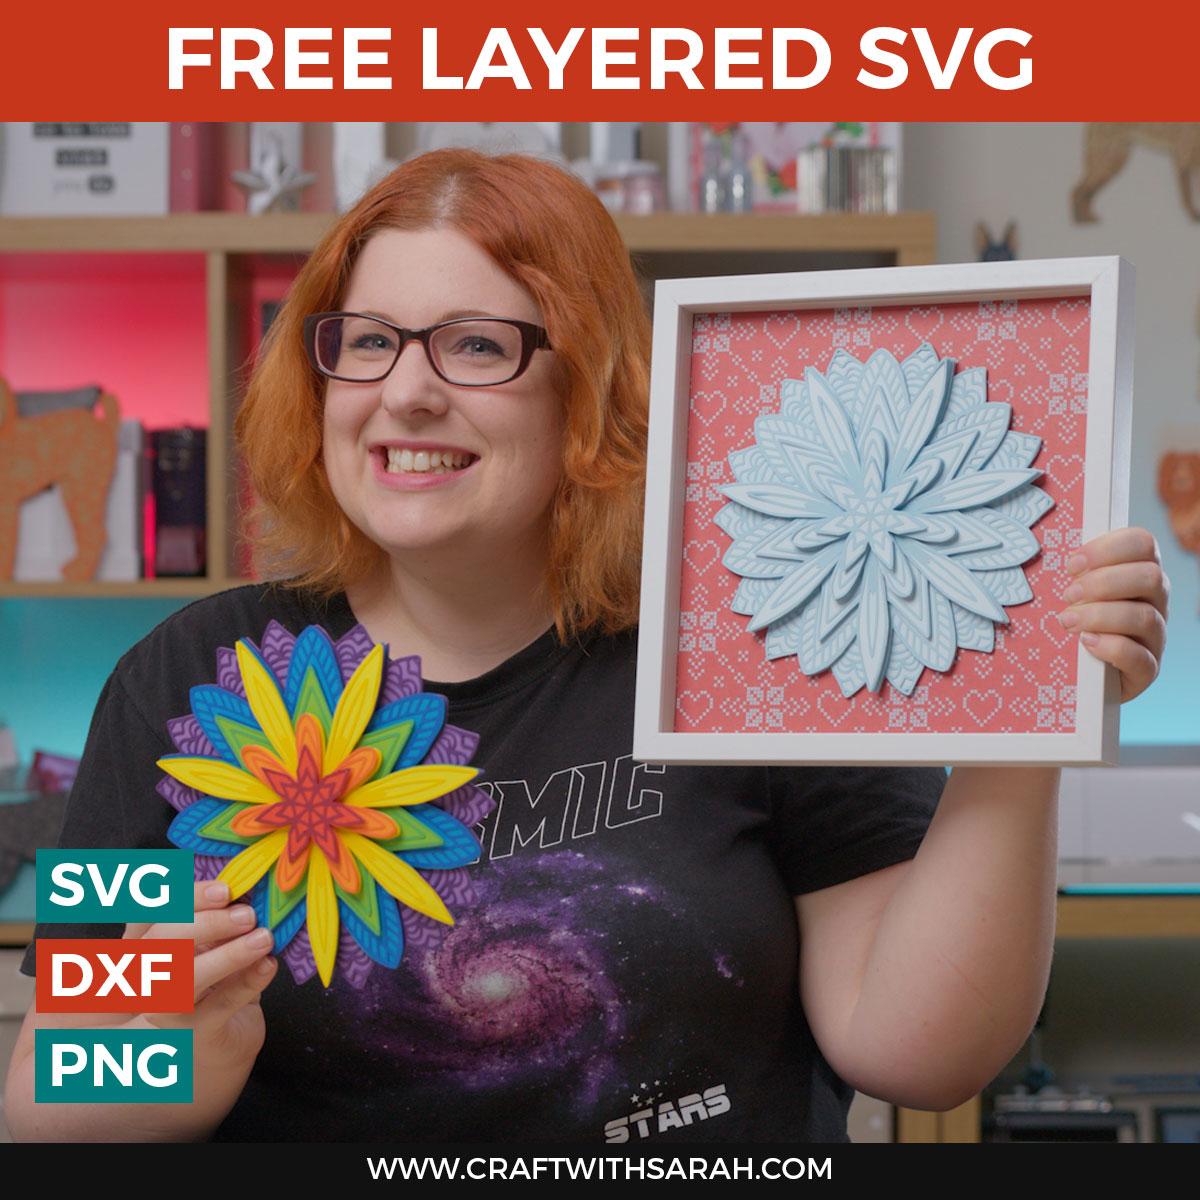 Free 3D Layered Mandala SVG: How to Make 3D Mandala Crafts